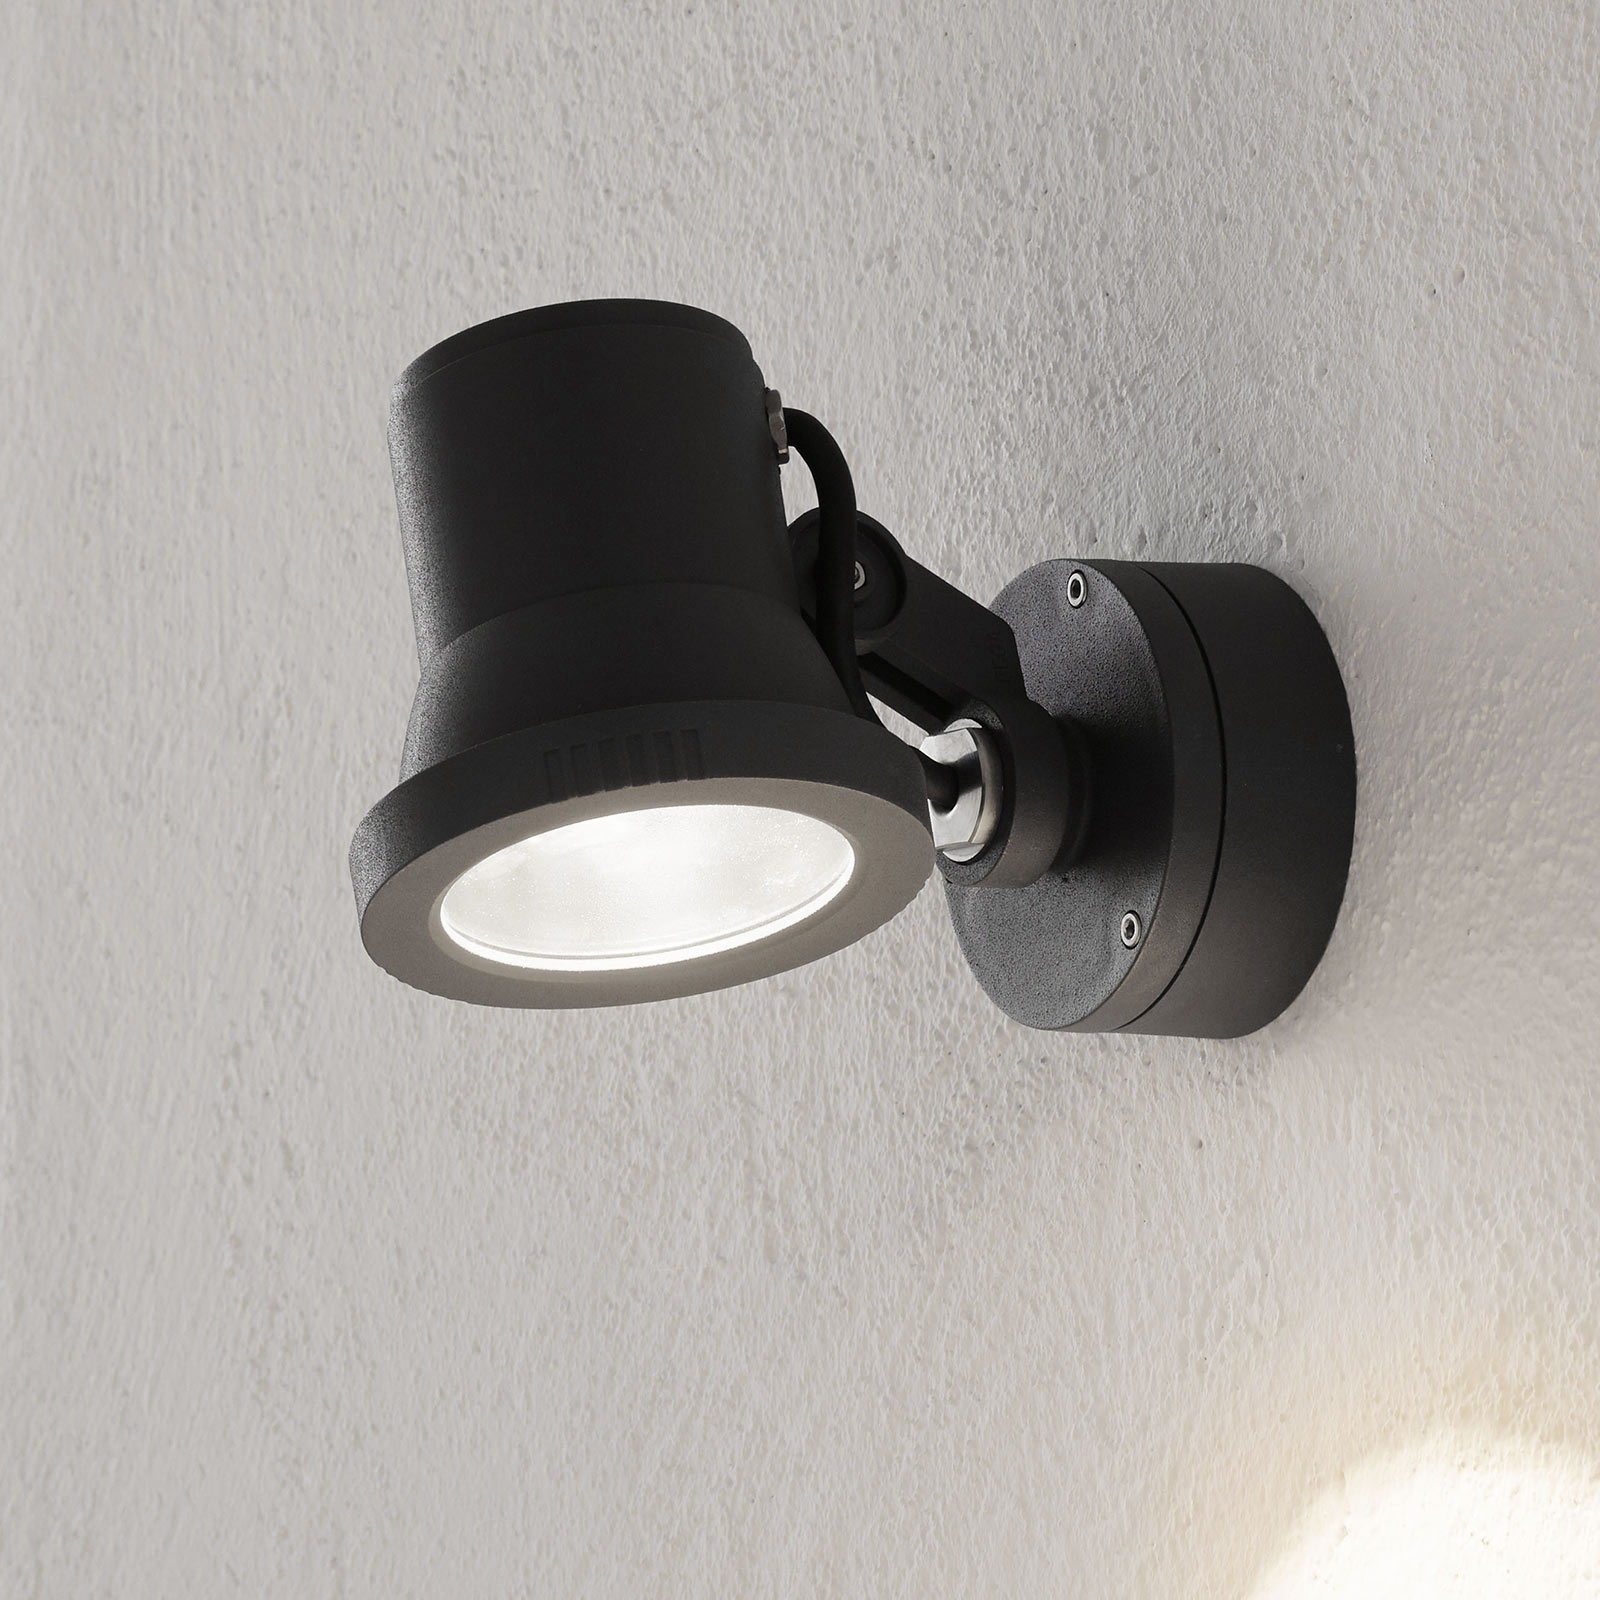 BEGA 84366 phare LED avec boîtier de montage